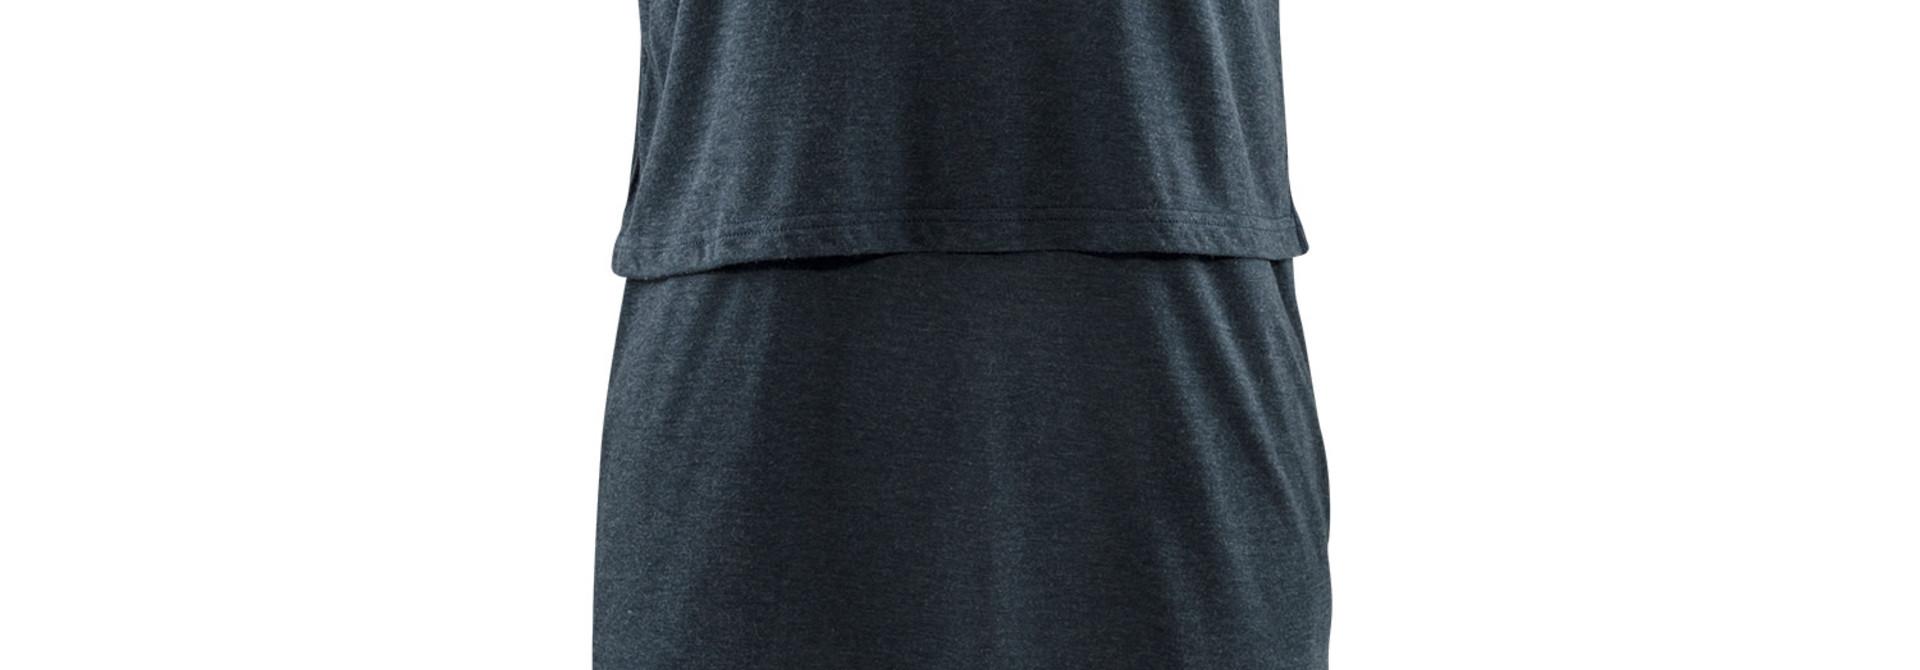 Fjällräven High Coast T-shirt Dress W Navy